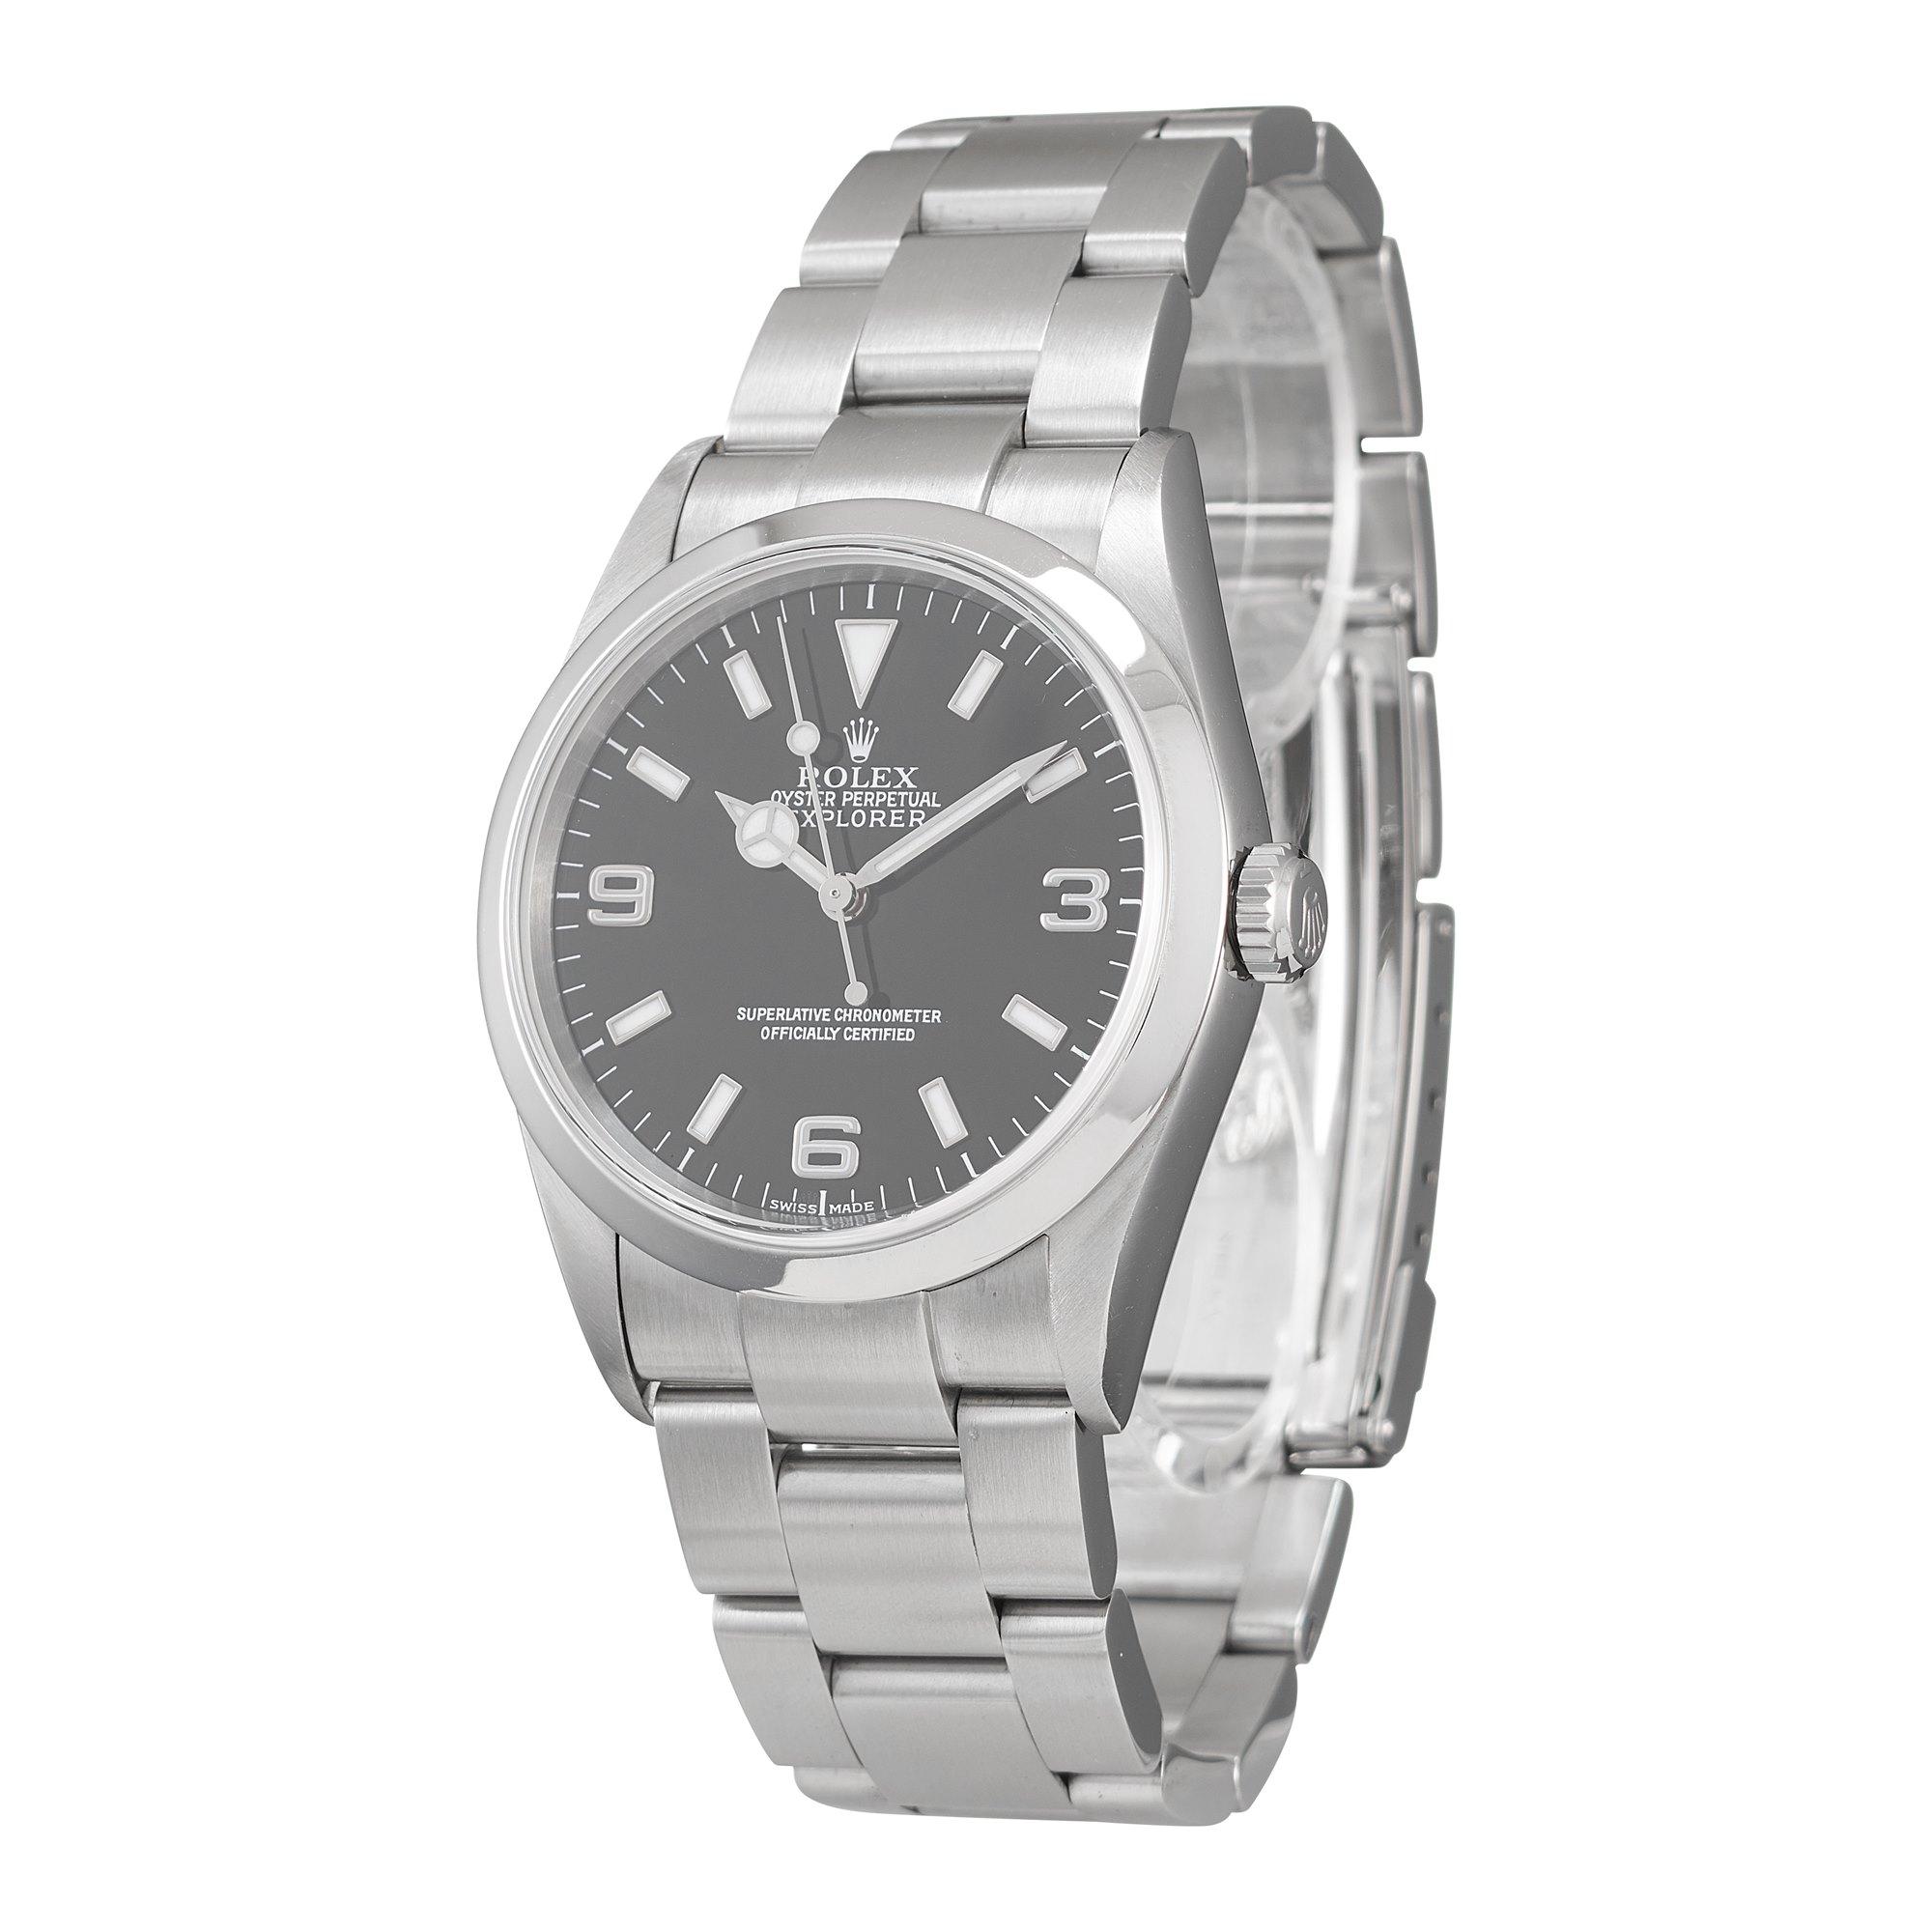 Rolex Explorer I Stainless Steel 114270